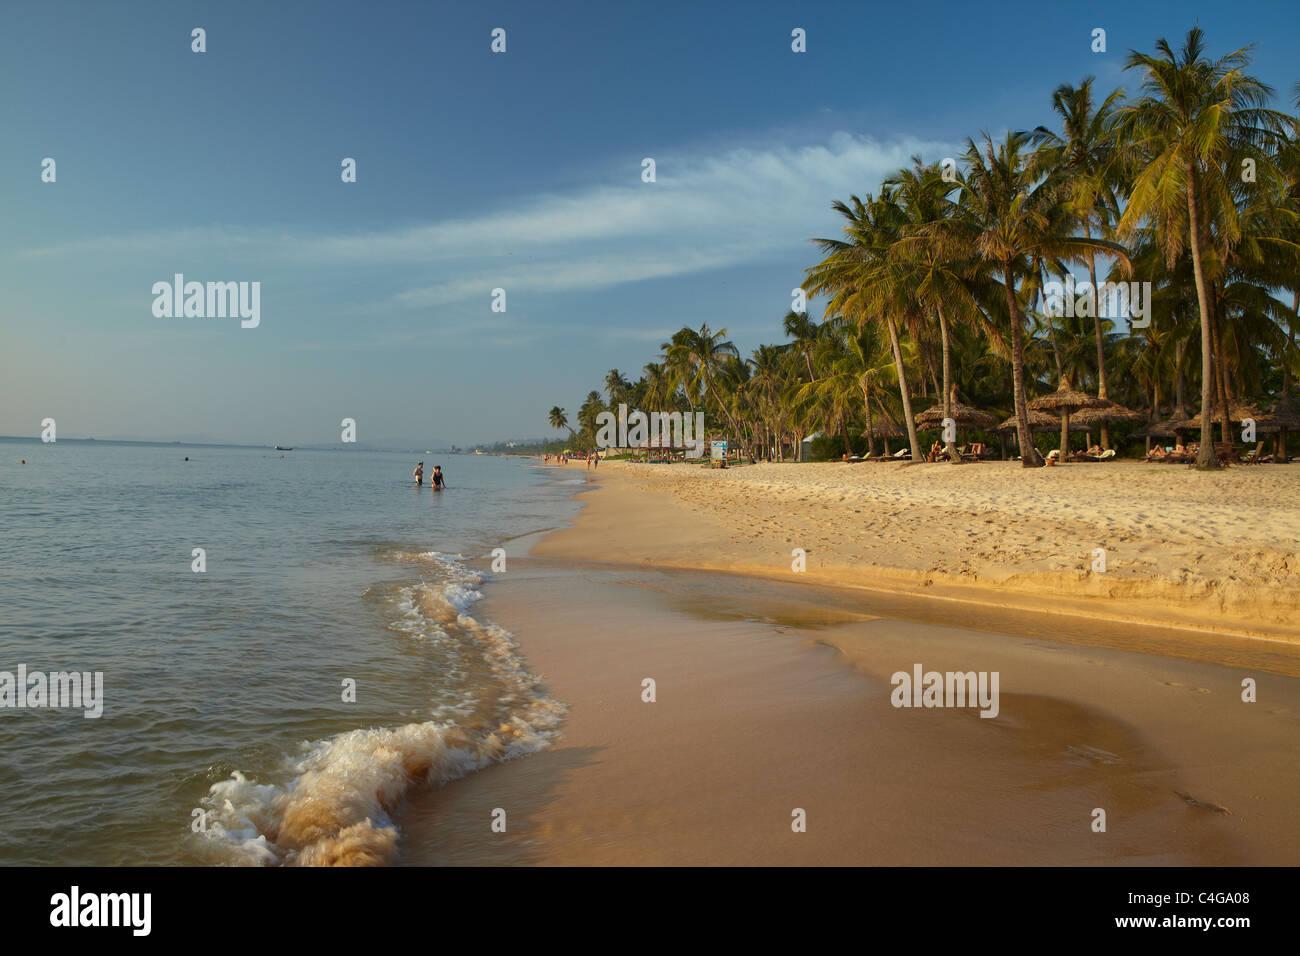 the beach on Phu Quoc, Vietnam - Stock Image